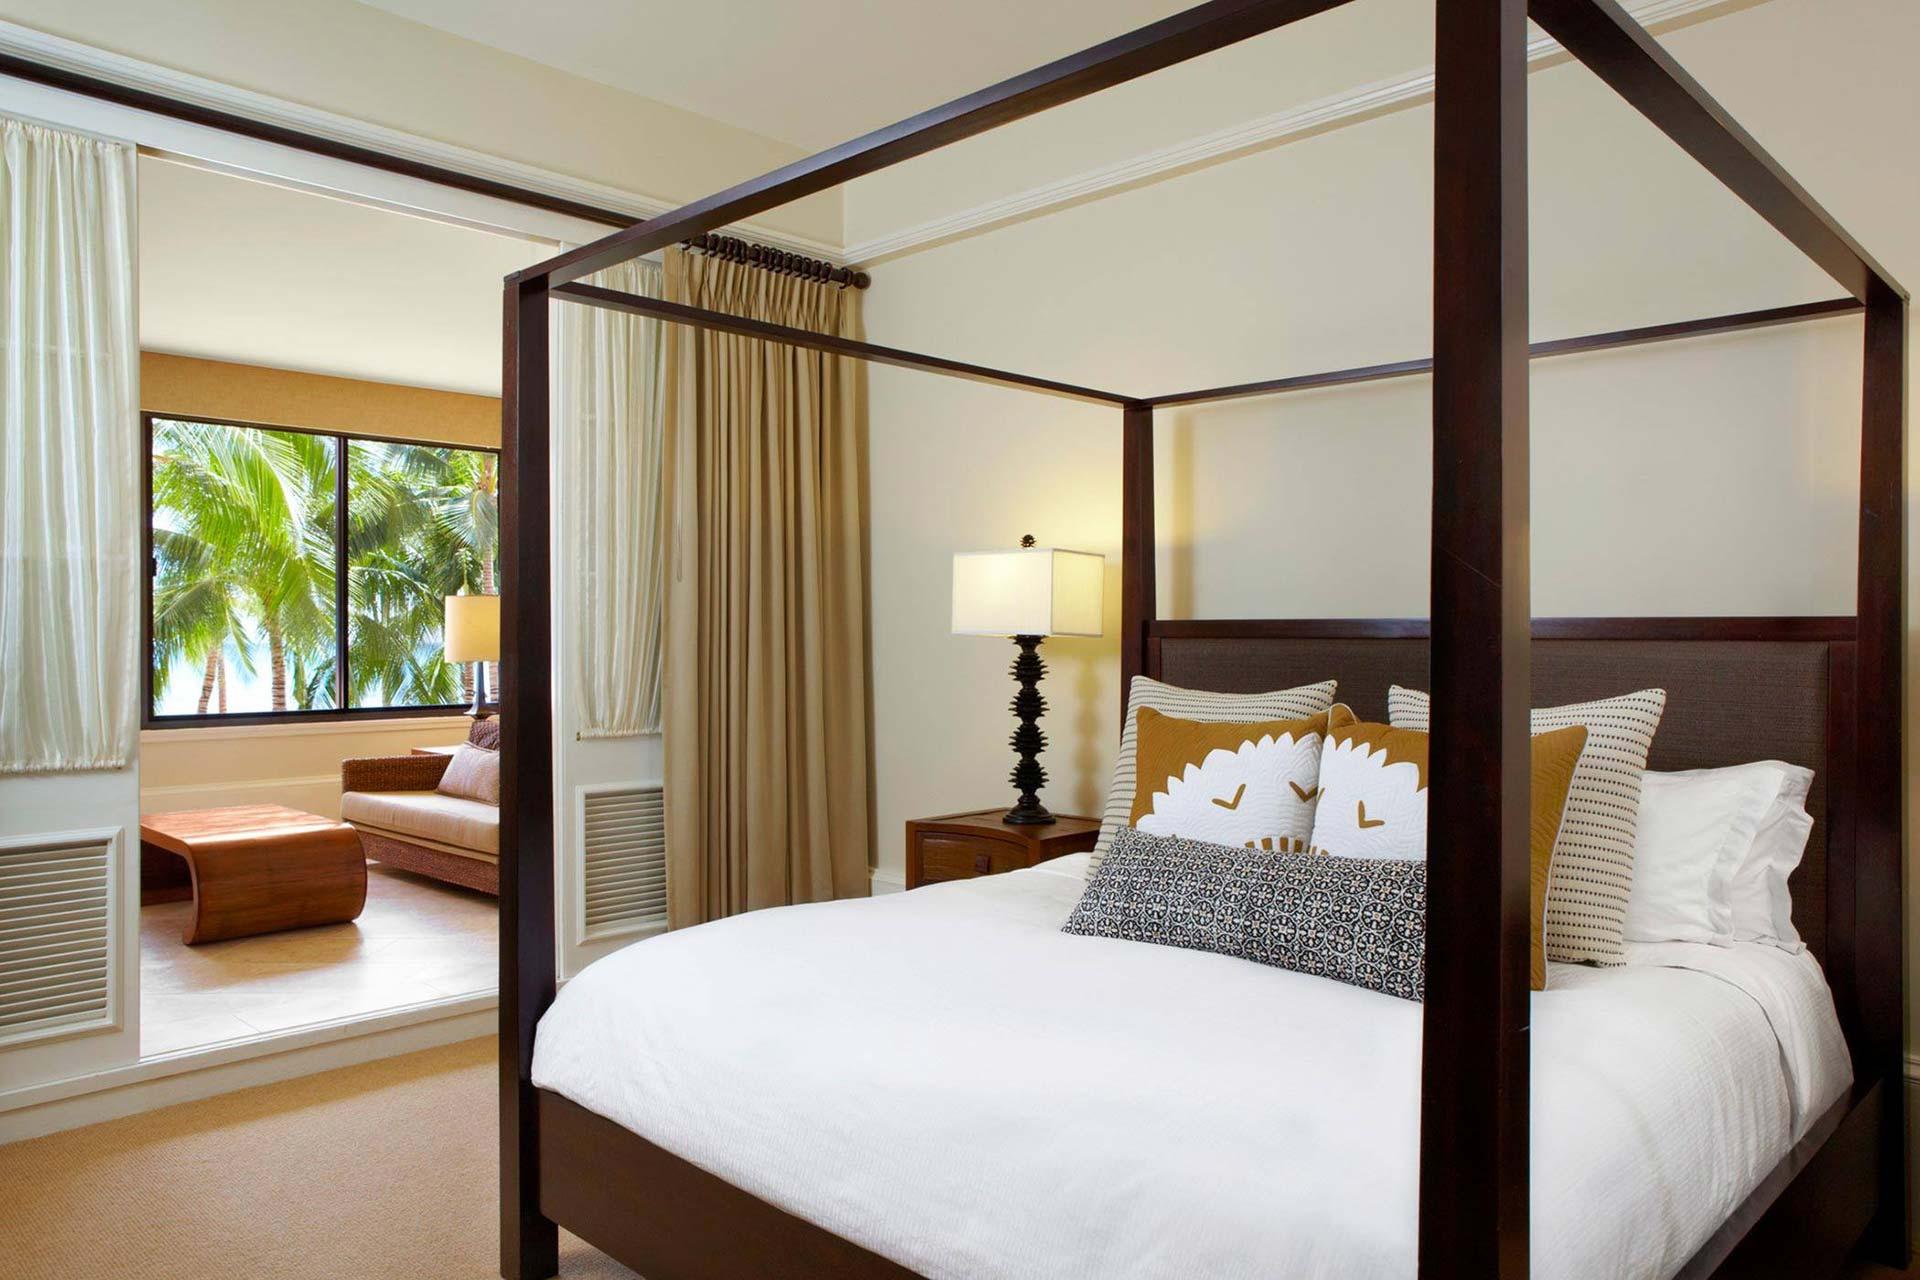 lux376gr-113141-royal-hawaiian-hotel-rooms-Queen-Kaahumanu-Suite-Master-Bedroom-Med